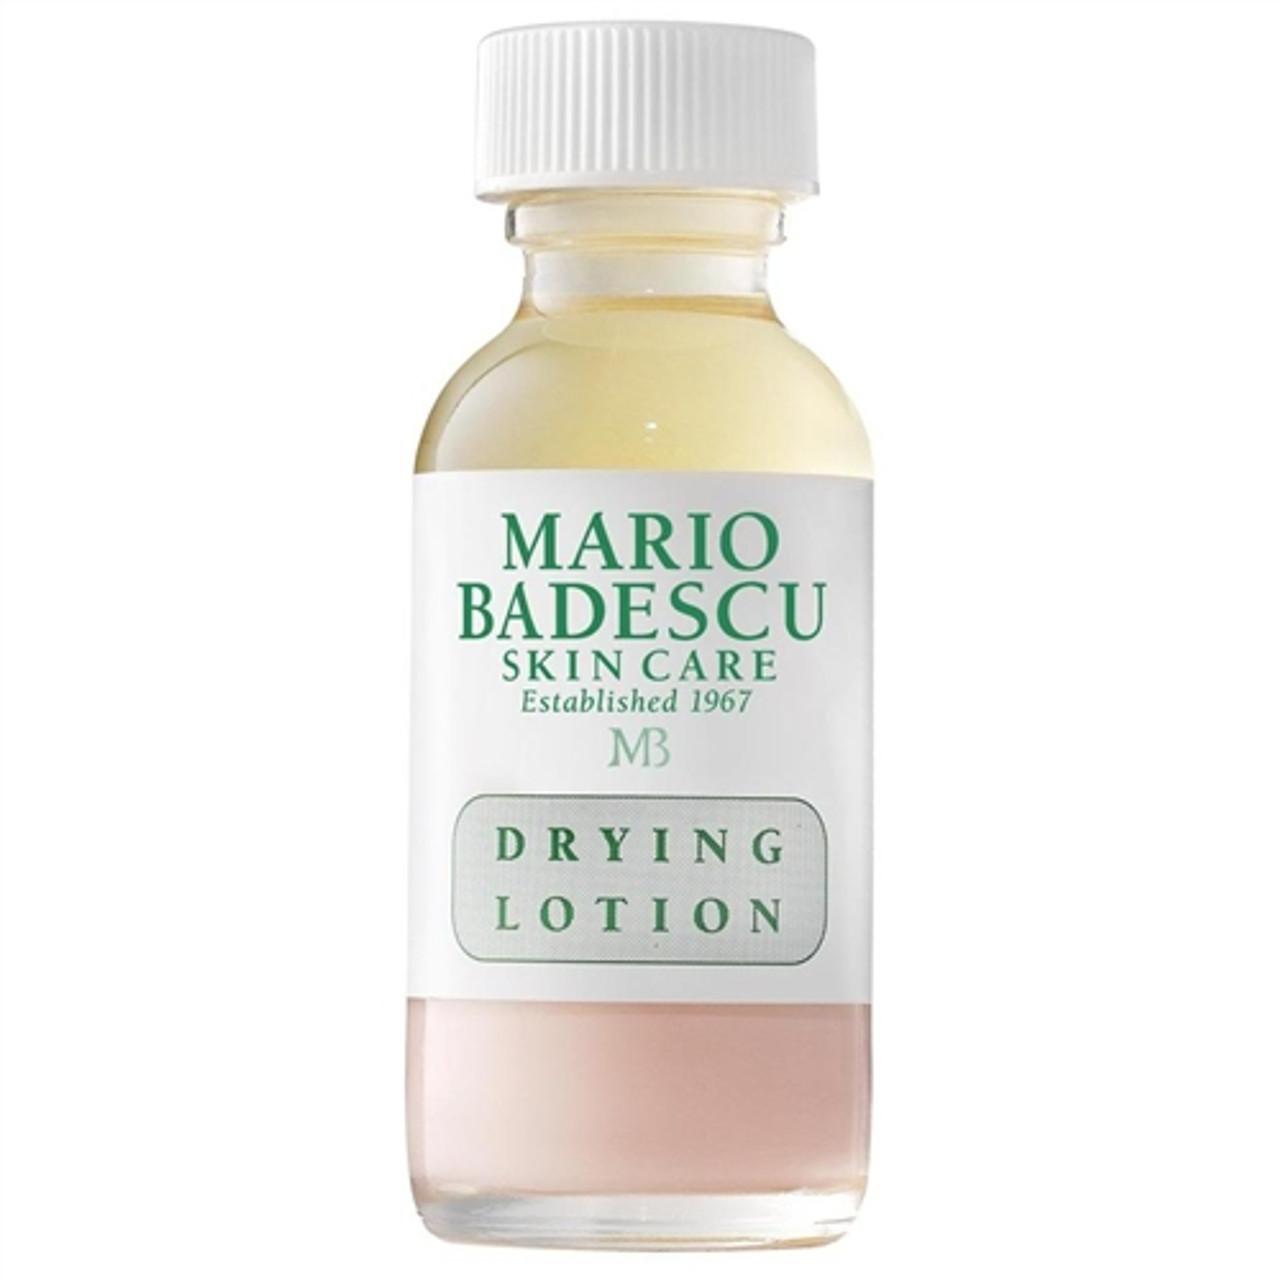 Mario Badescu Drying Lotion - Glass 1 oz